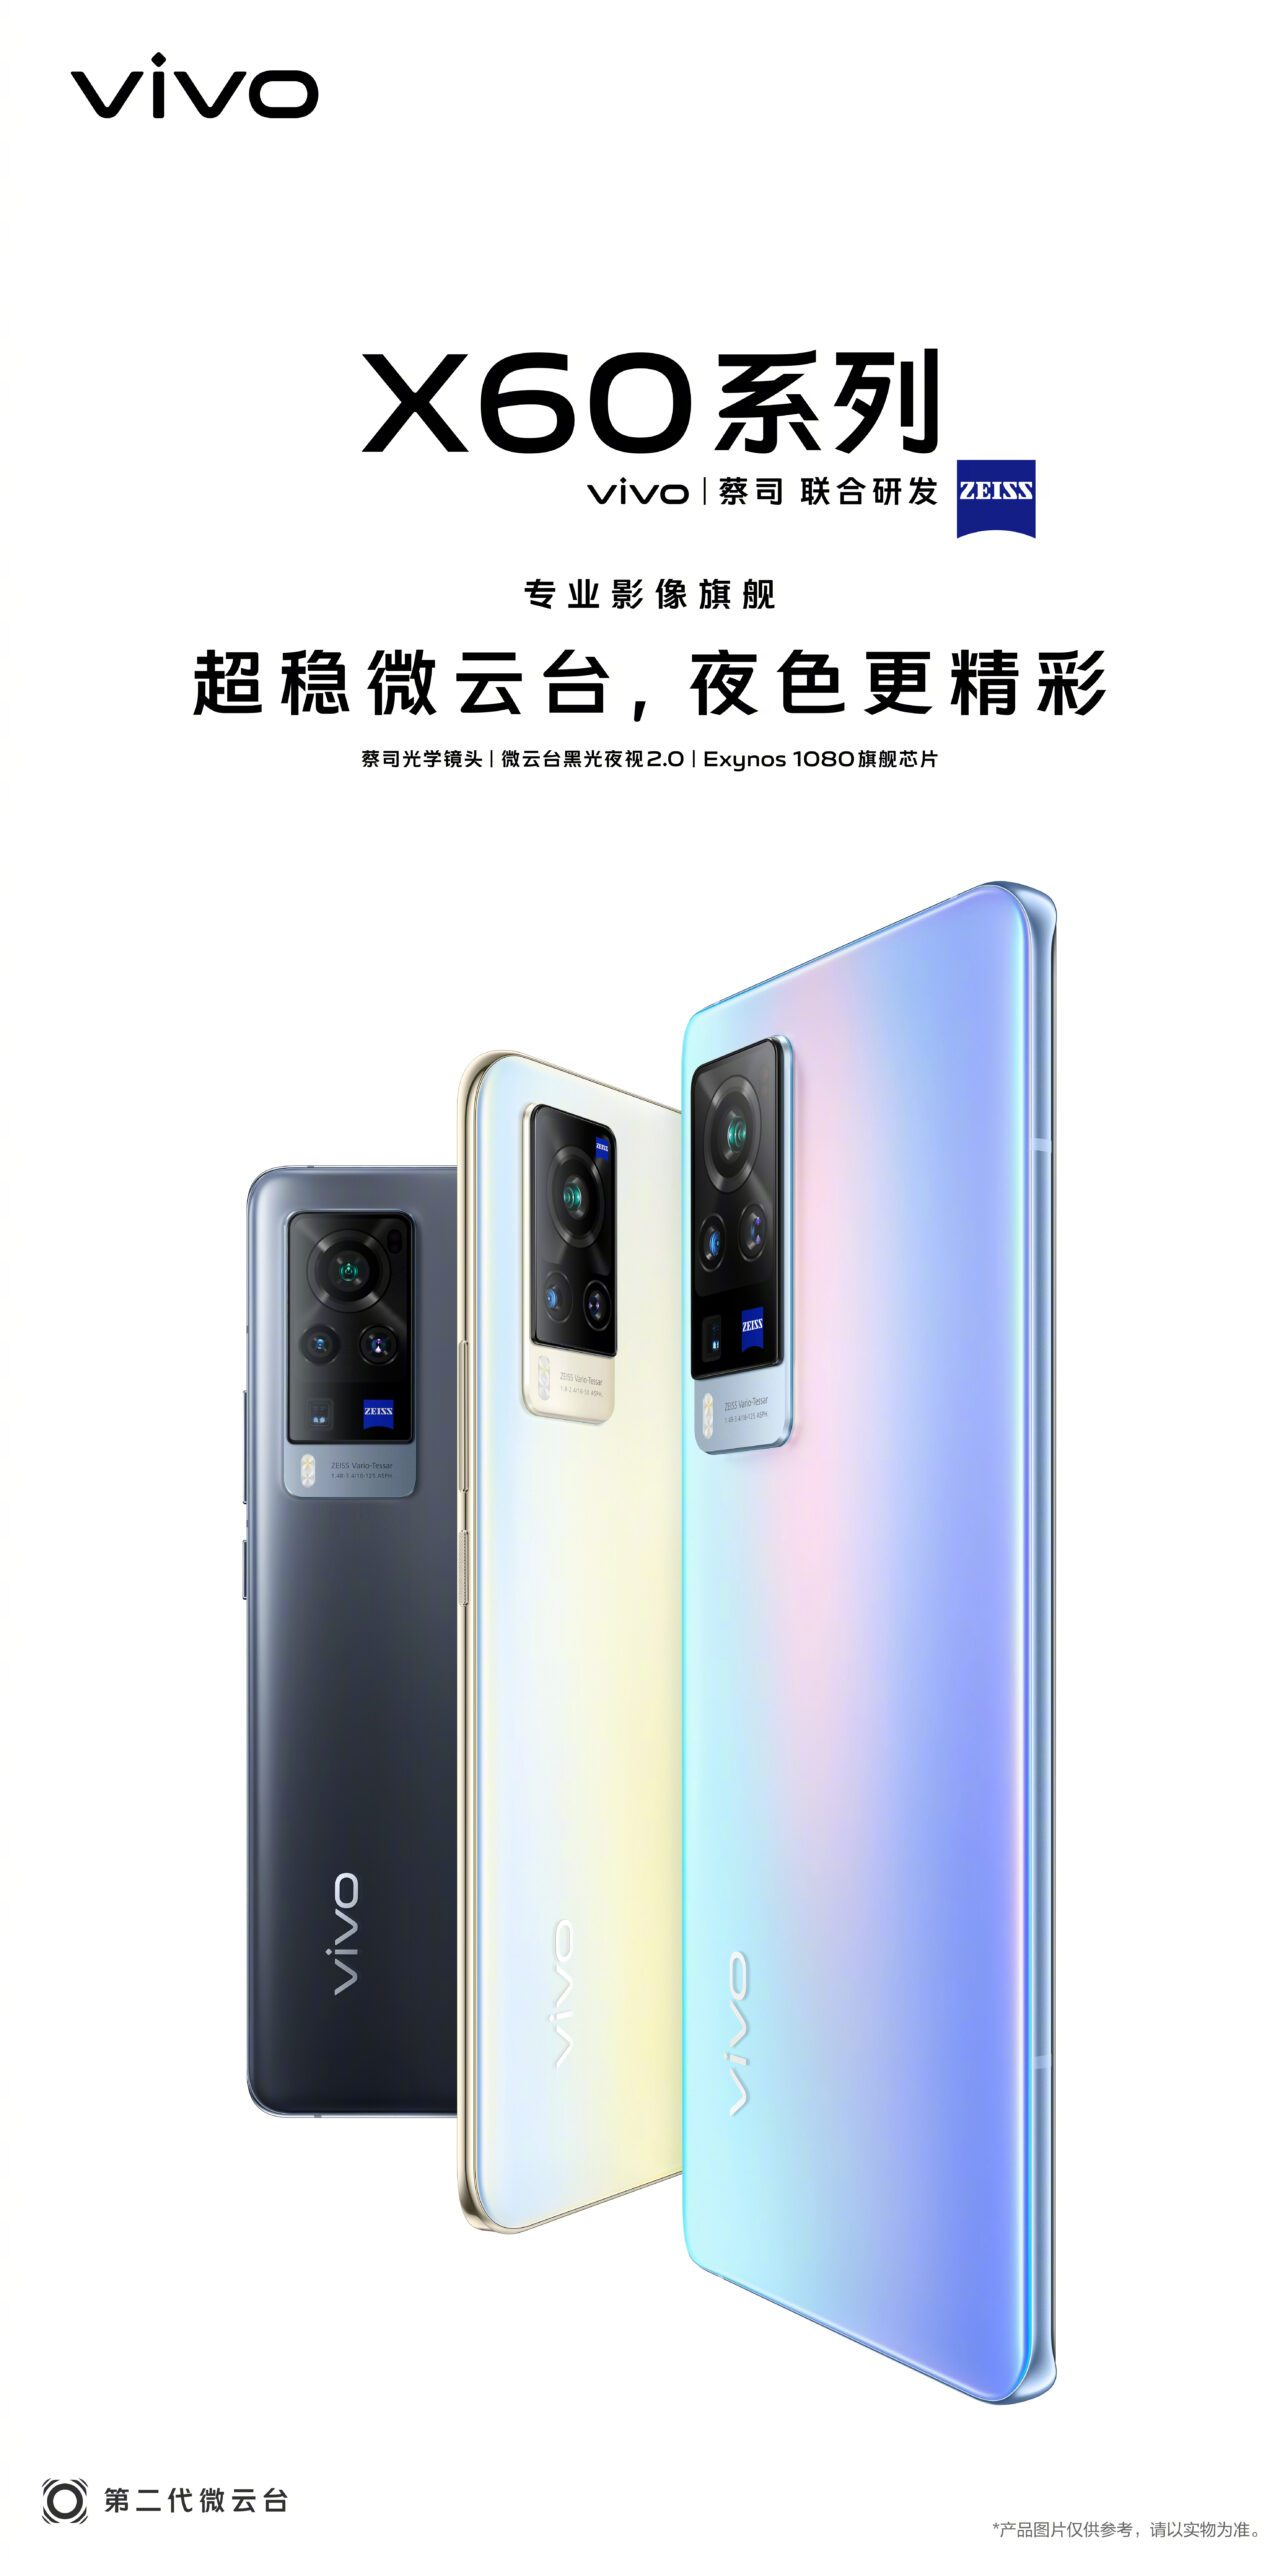 OPPO представила концептуальный смартфон, складывающийся втрое